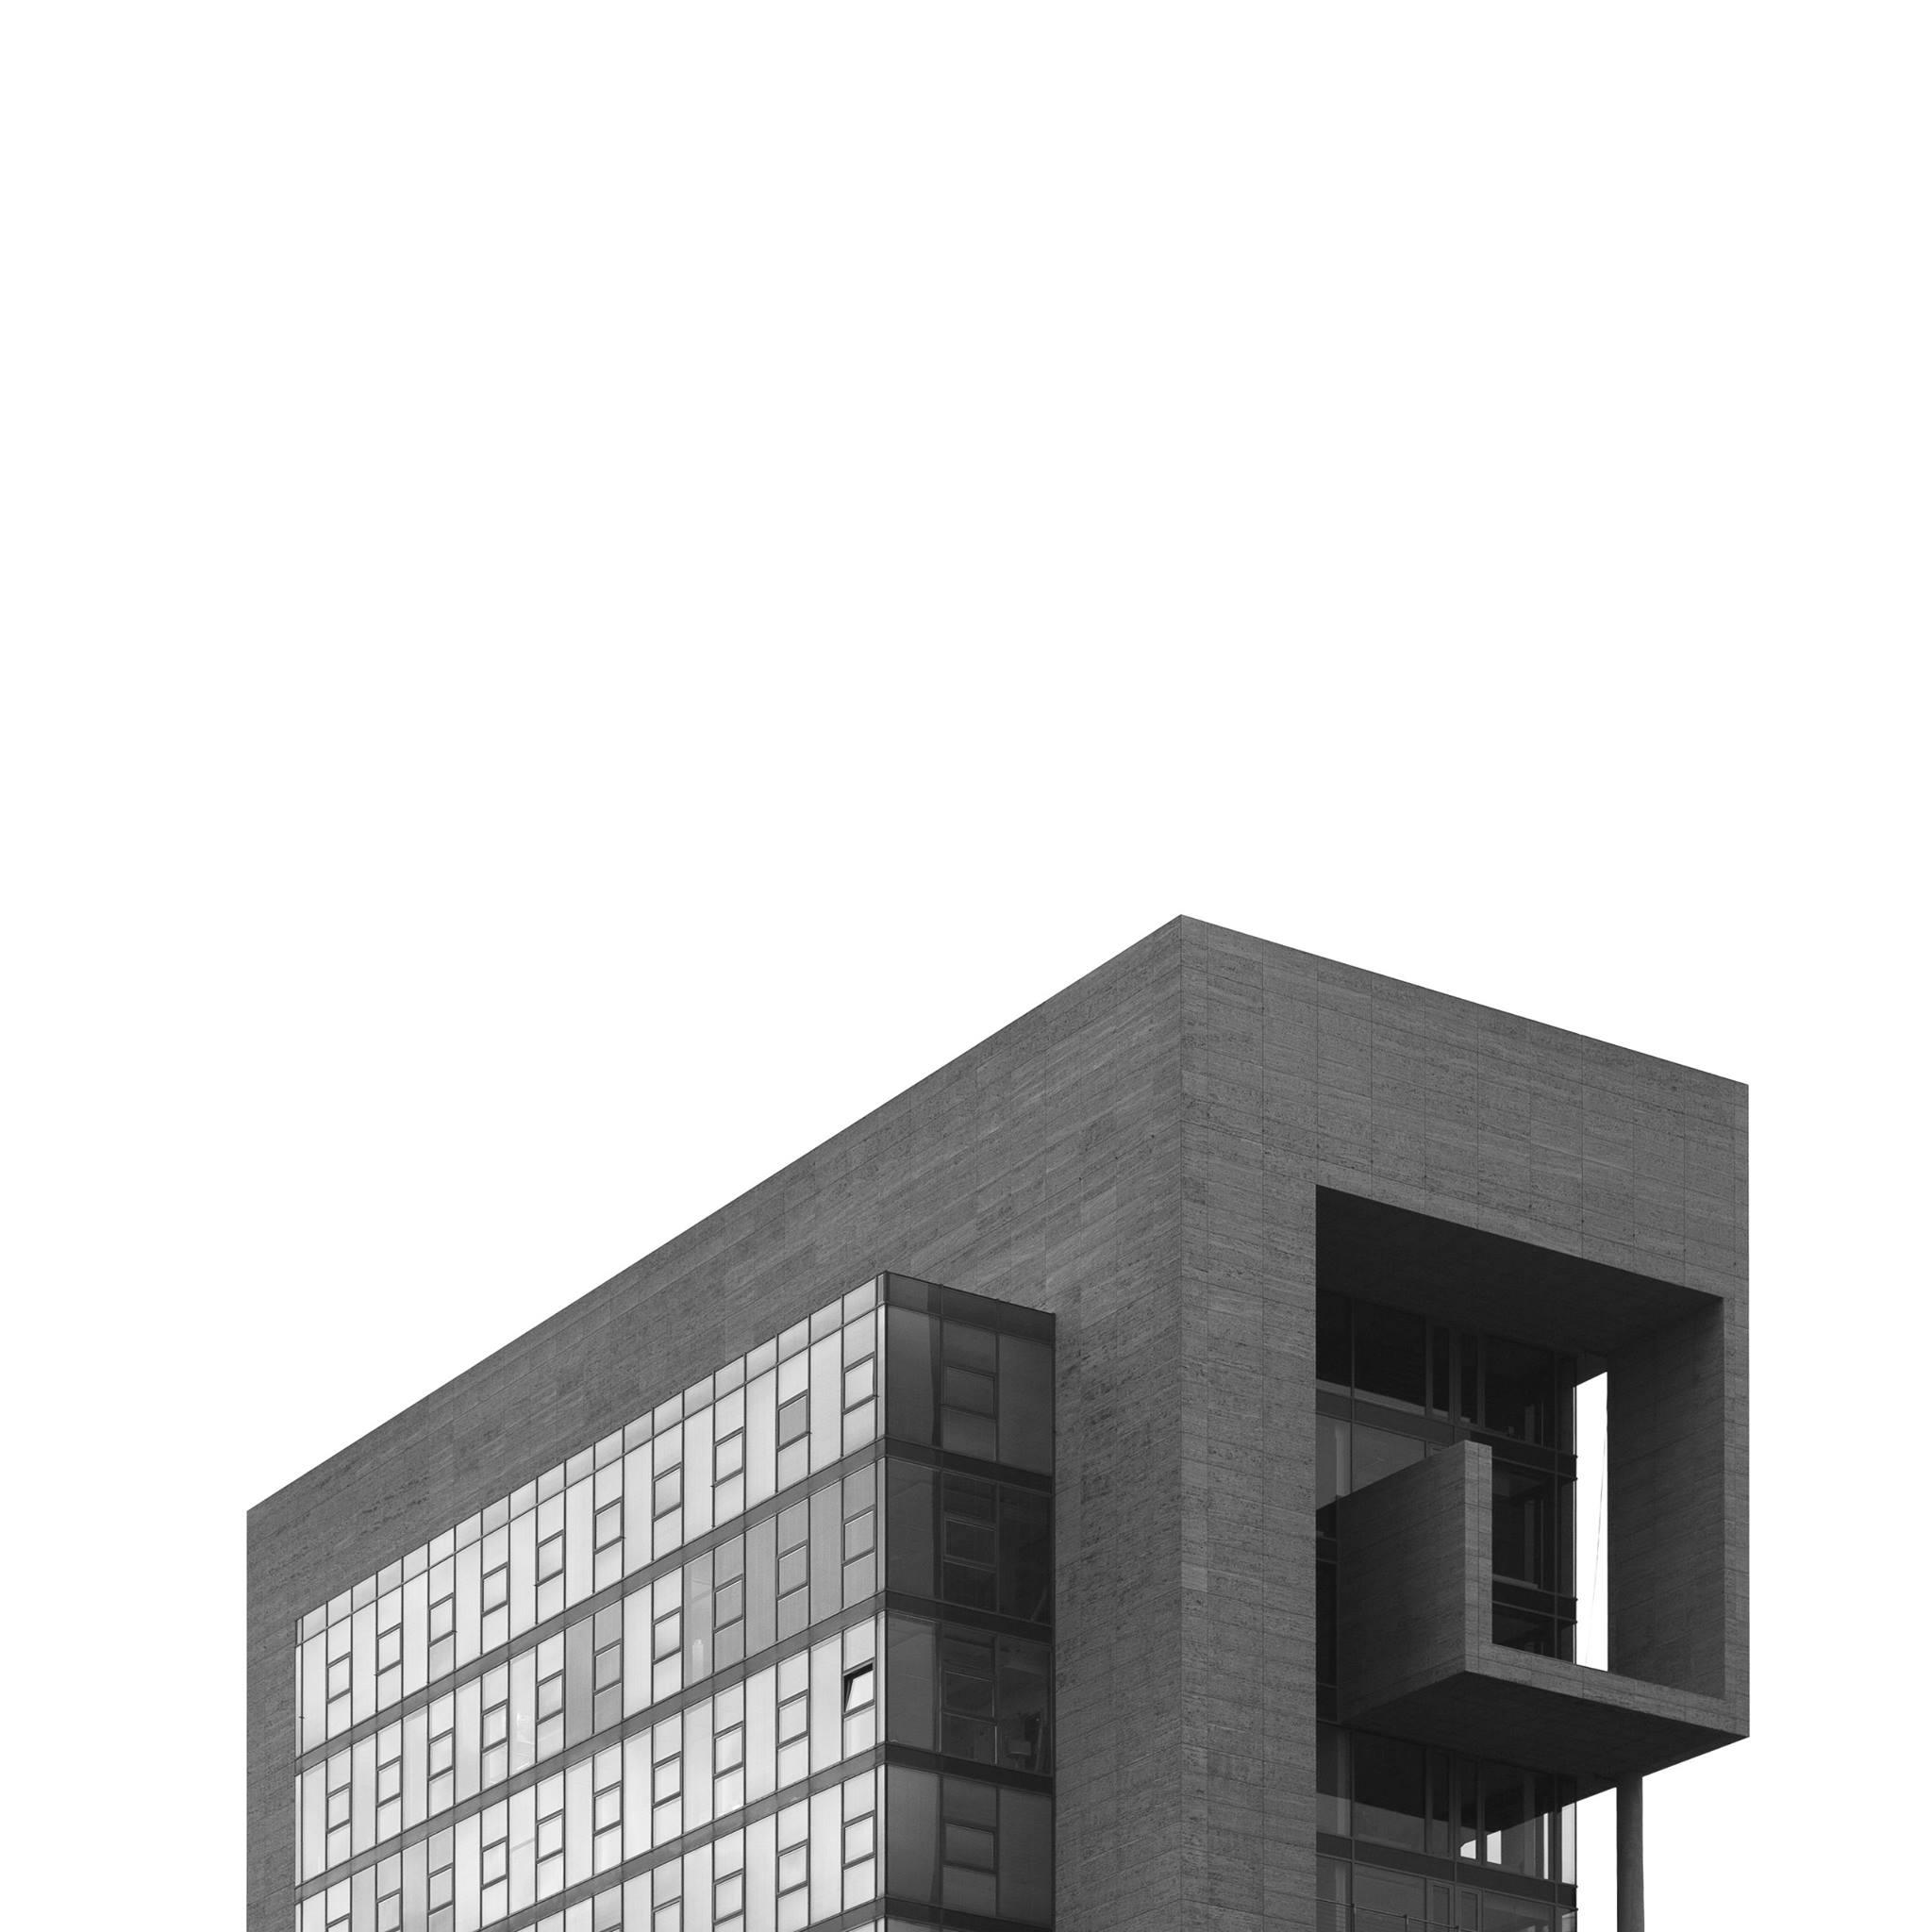 kevin-krautgartner-architecture-photography-15